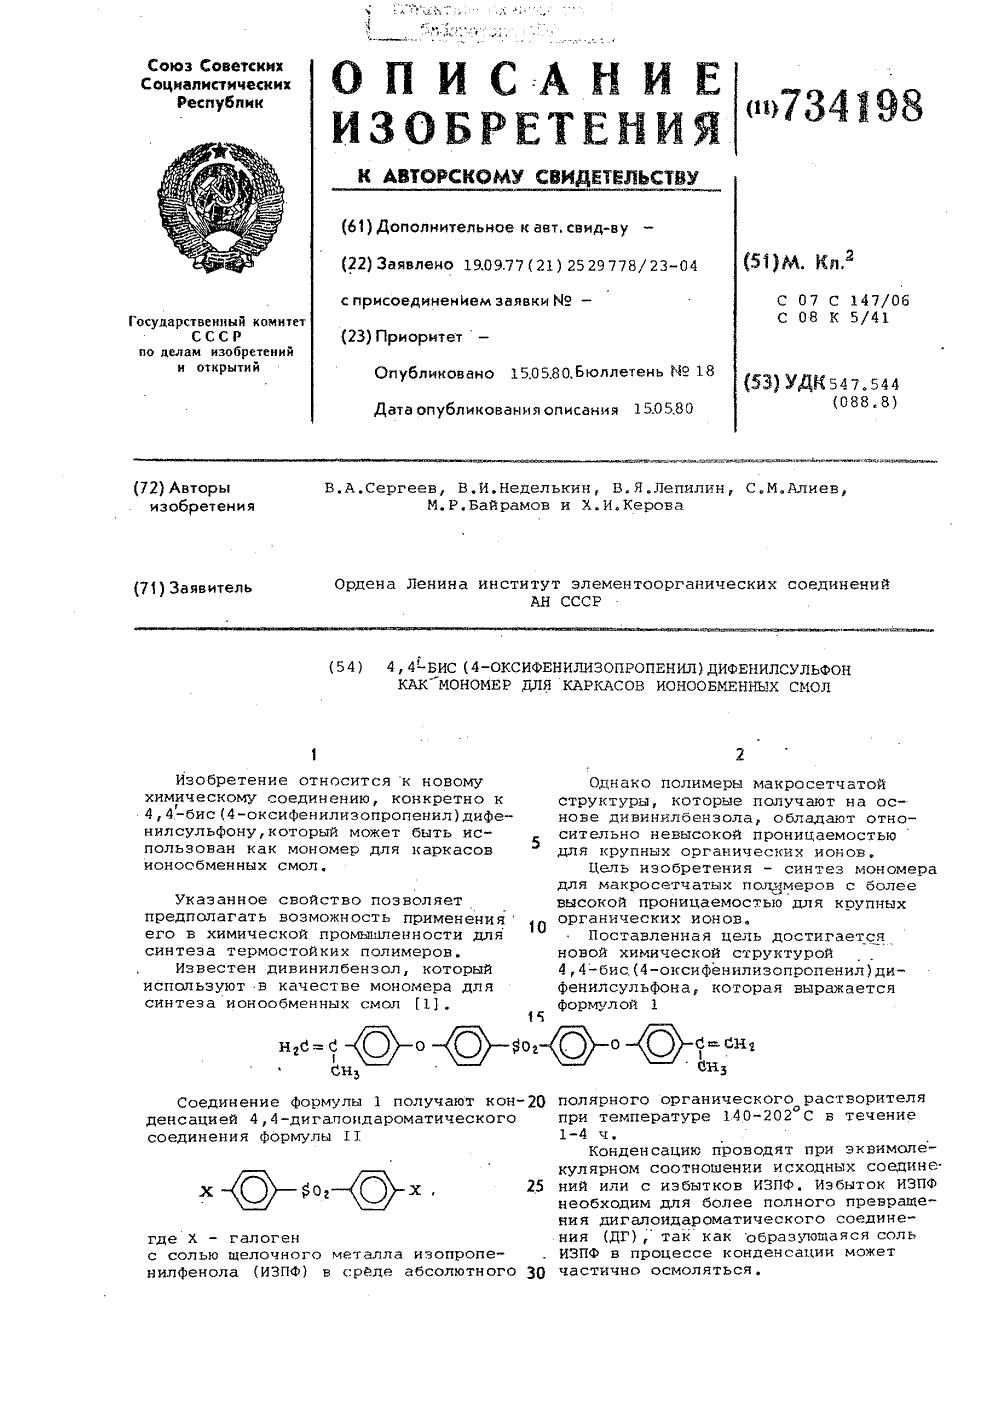 1-дихлор-2,2-бис(3-амино-4-хлорфенил)этилена и диангидрида бис 4-(о-дикарбоксифенокси)фенил ацетилена с прив=